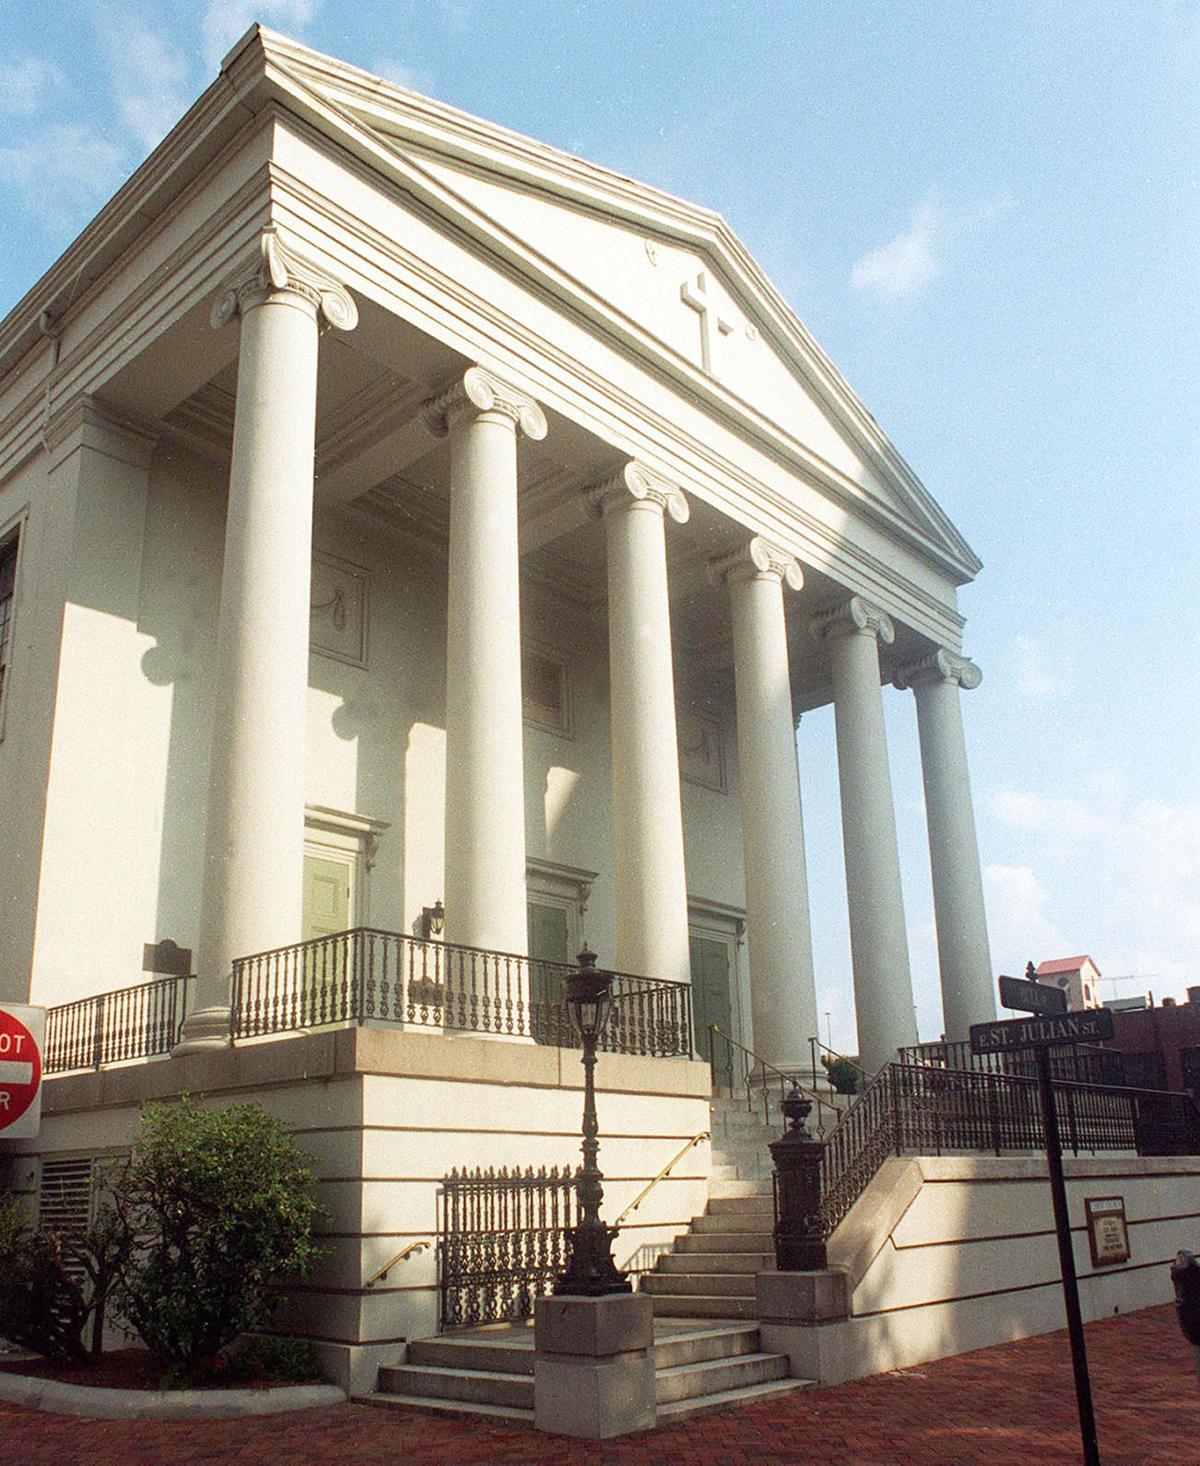 Ga  high court sides with Episcopal Church | Local News